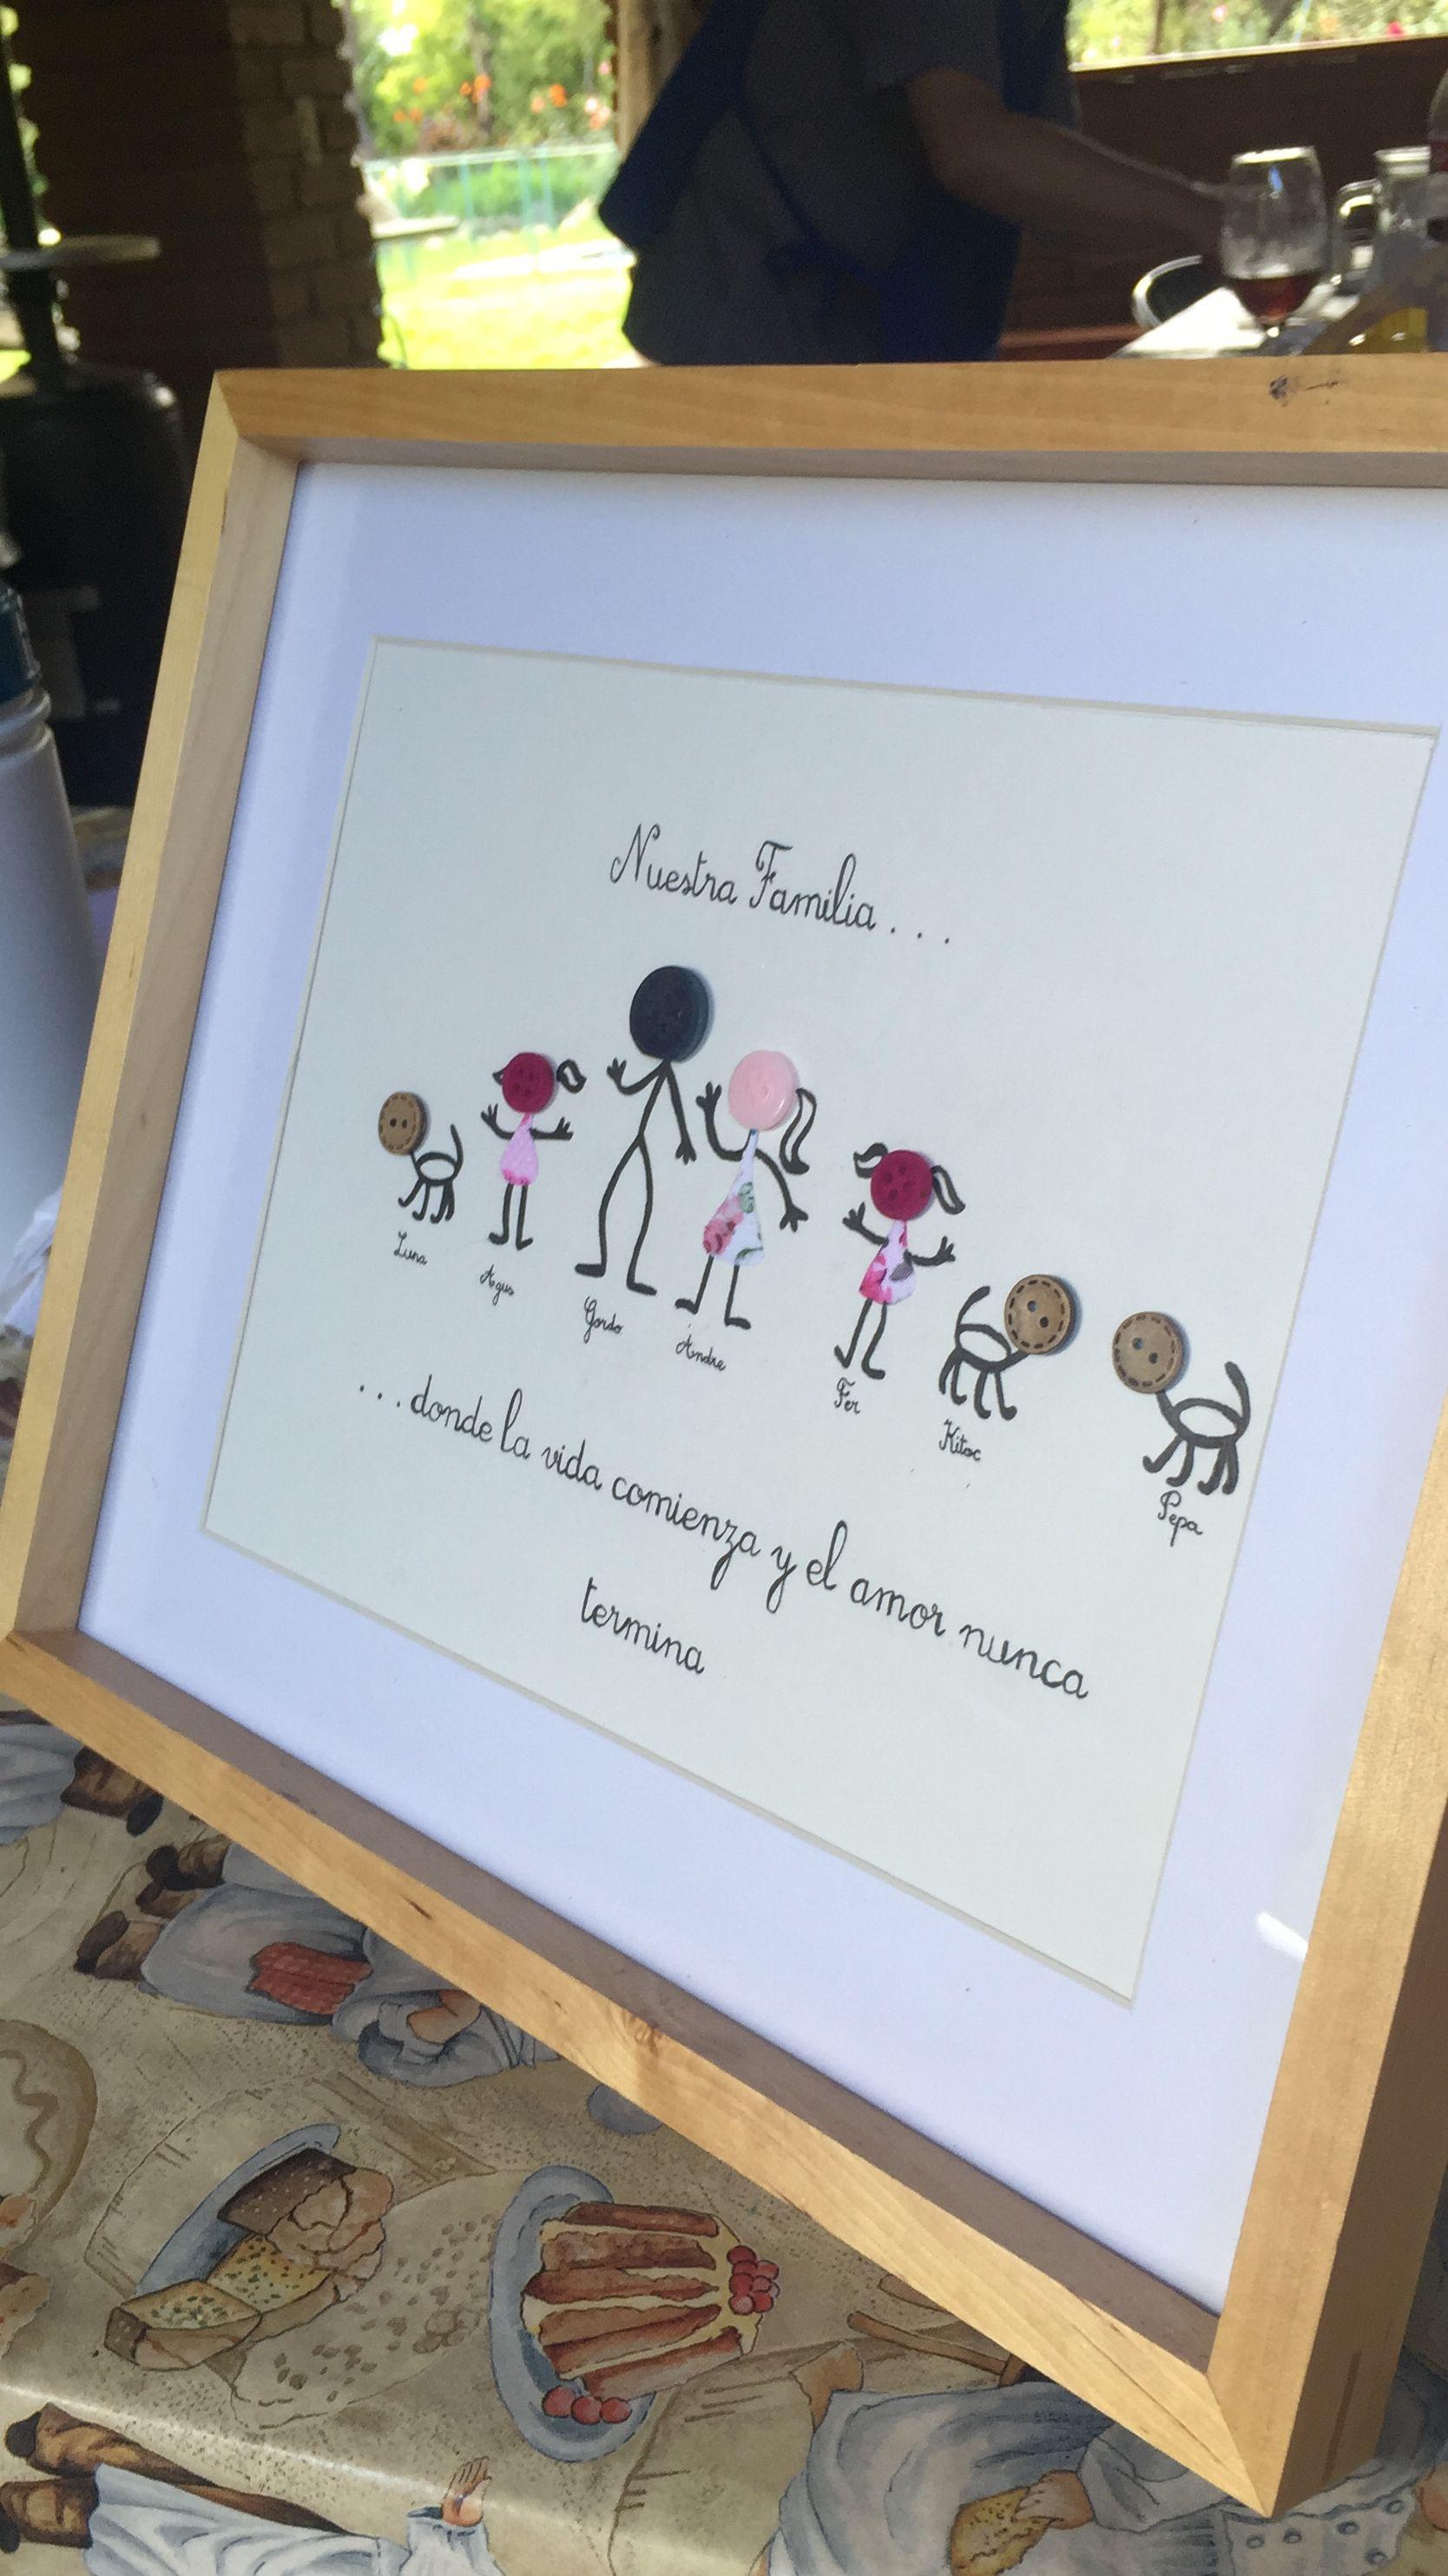 Pin de Shirley Thomas en Buttons | Pinterest | Marcos, Recuerdos y ...